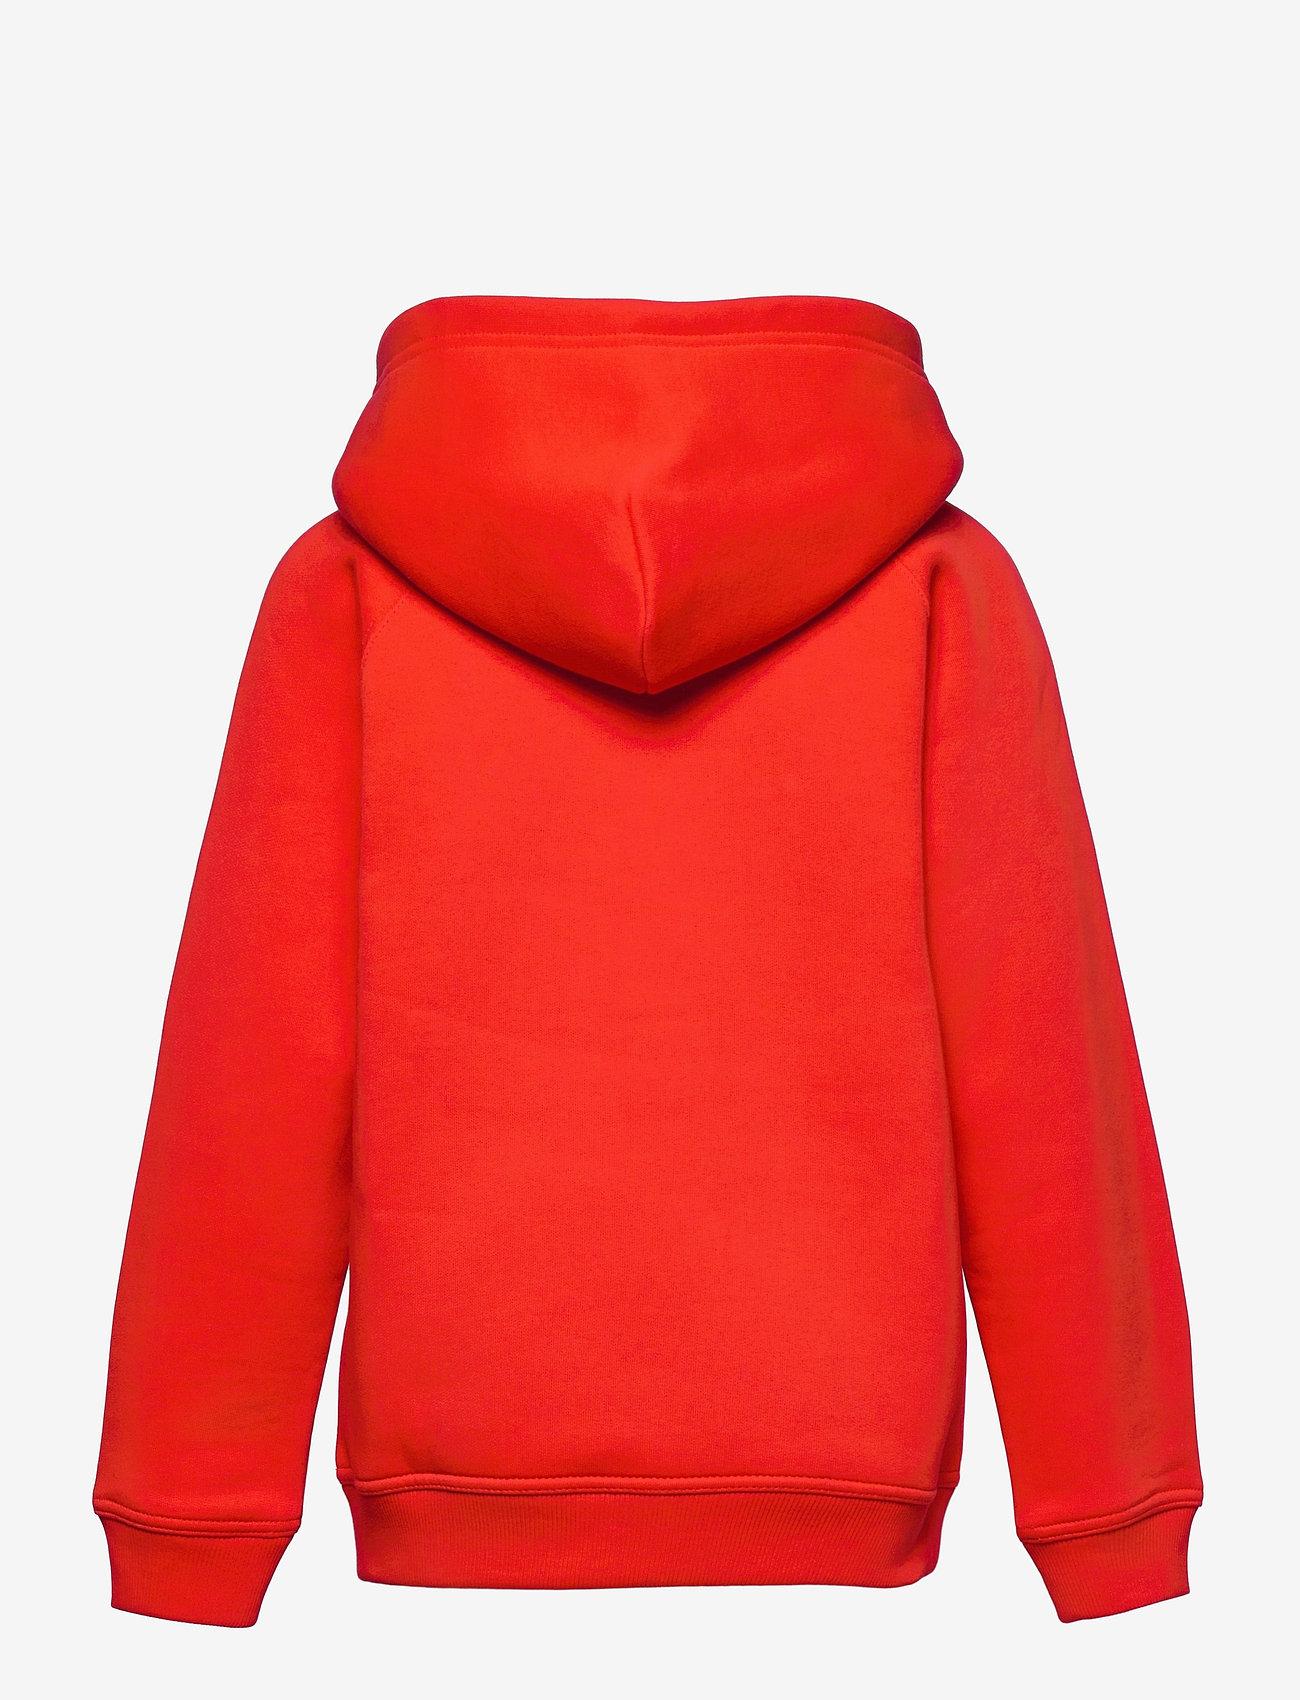 GANT - ARCHIVE SHIELD HOODIE - kapuzenpullover - lava red - 1